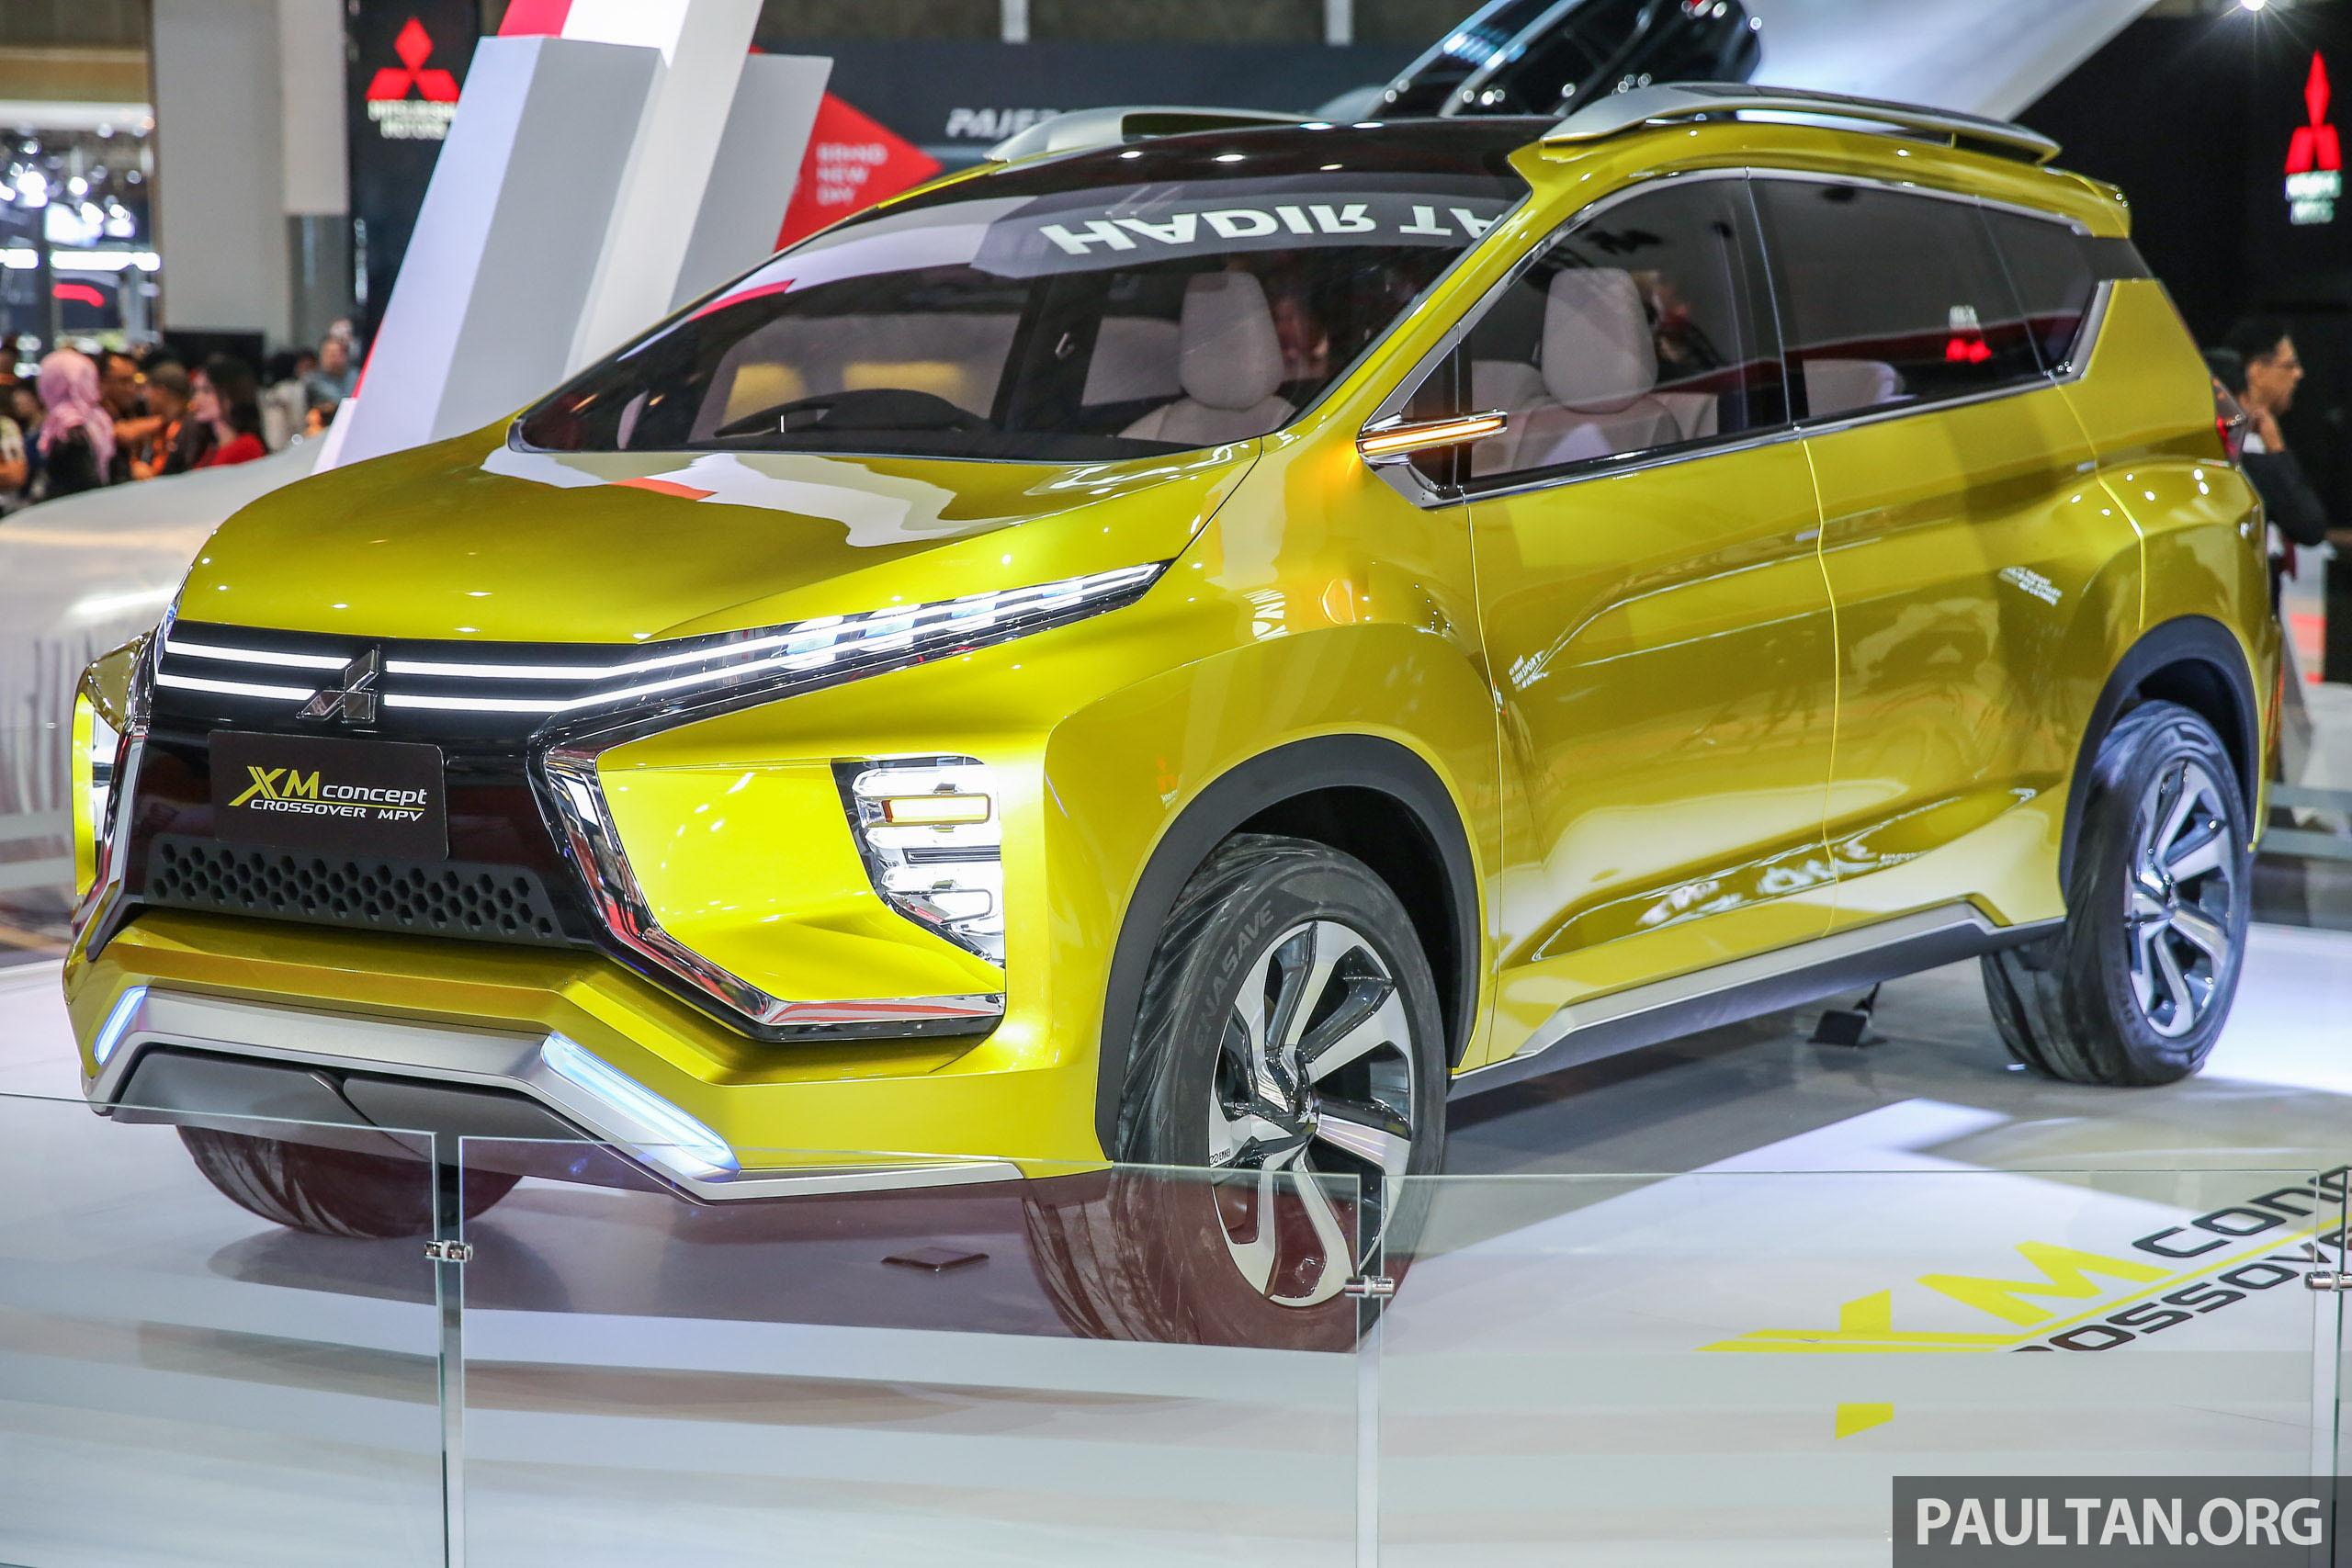 Iims 2017 Mitsubishi Xm Low Mpv Coming This Year Paultan Org